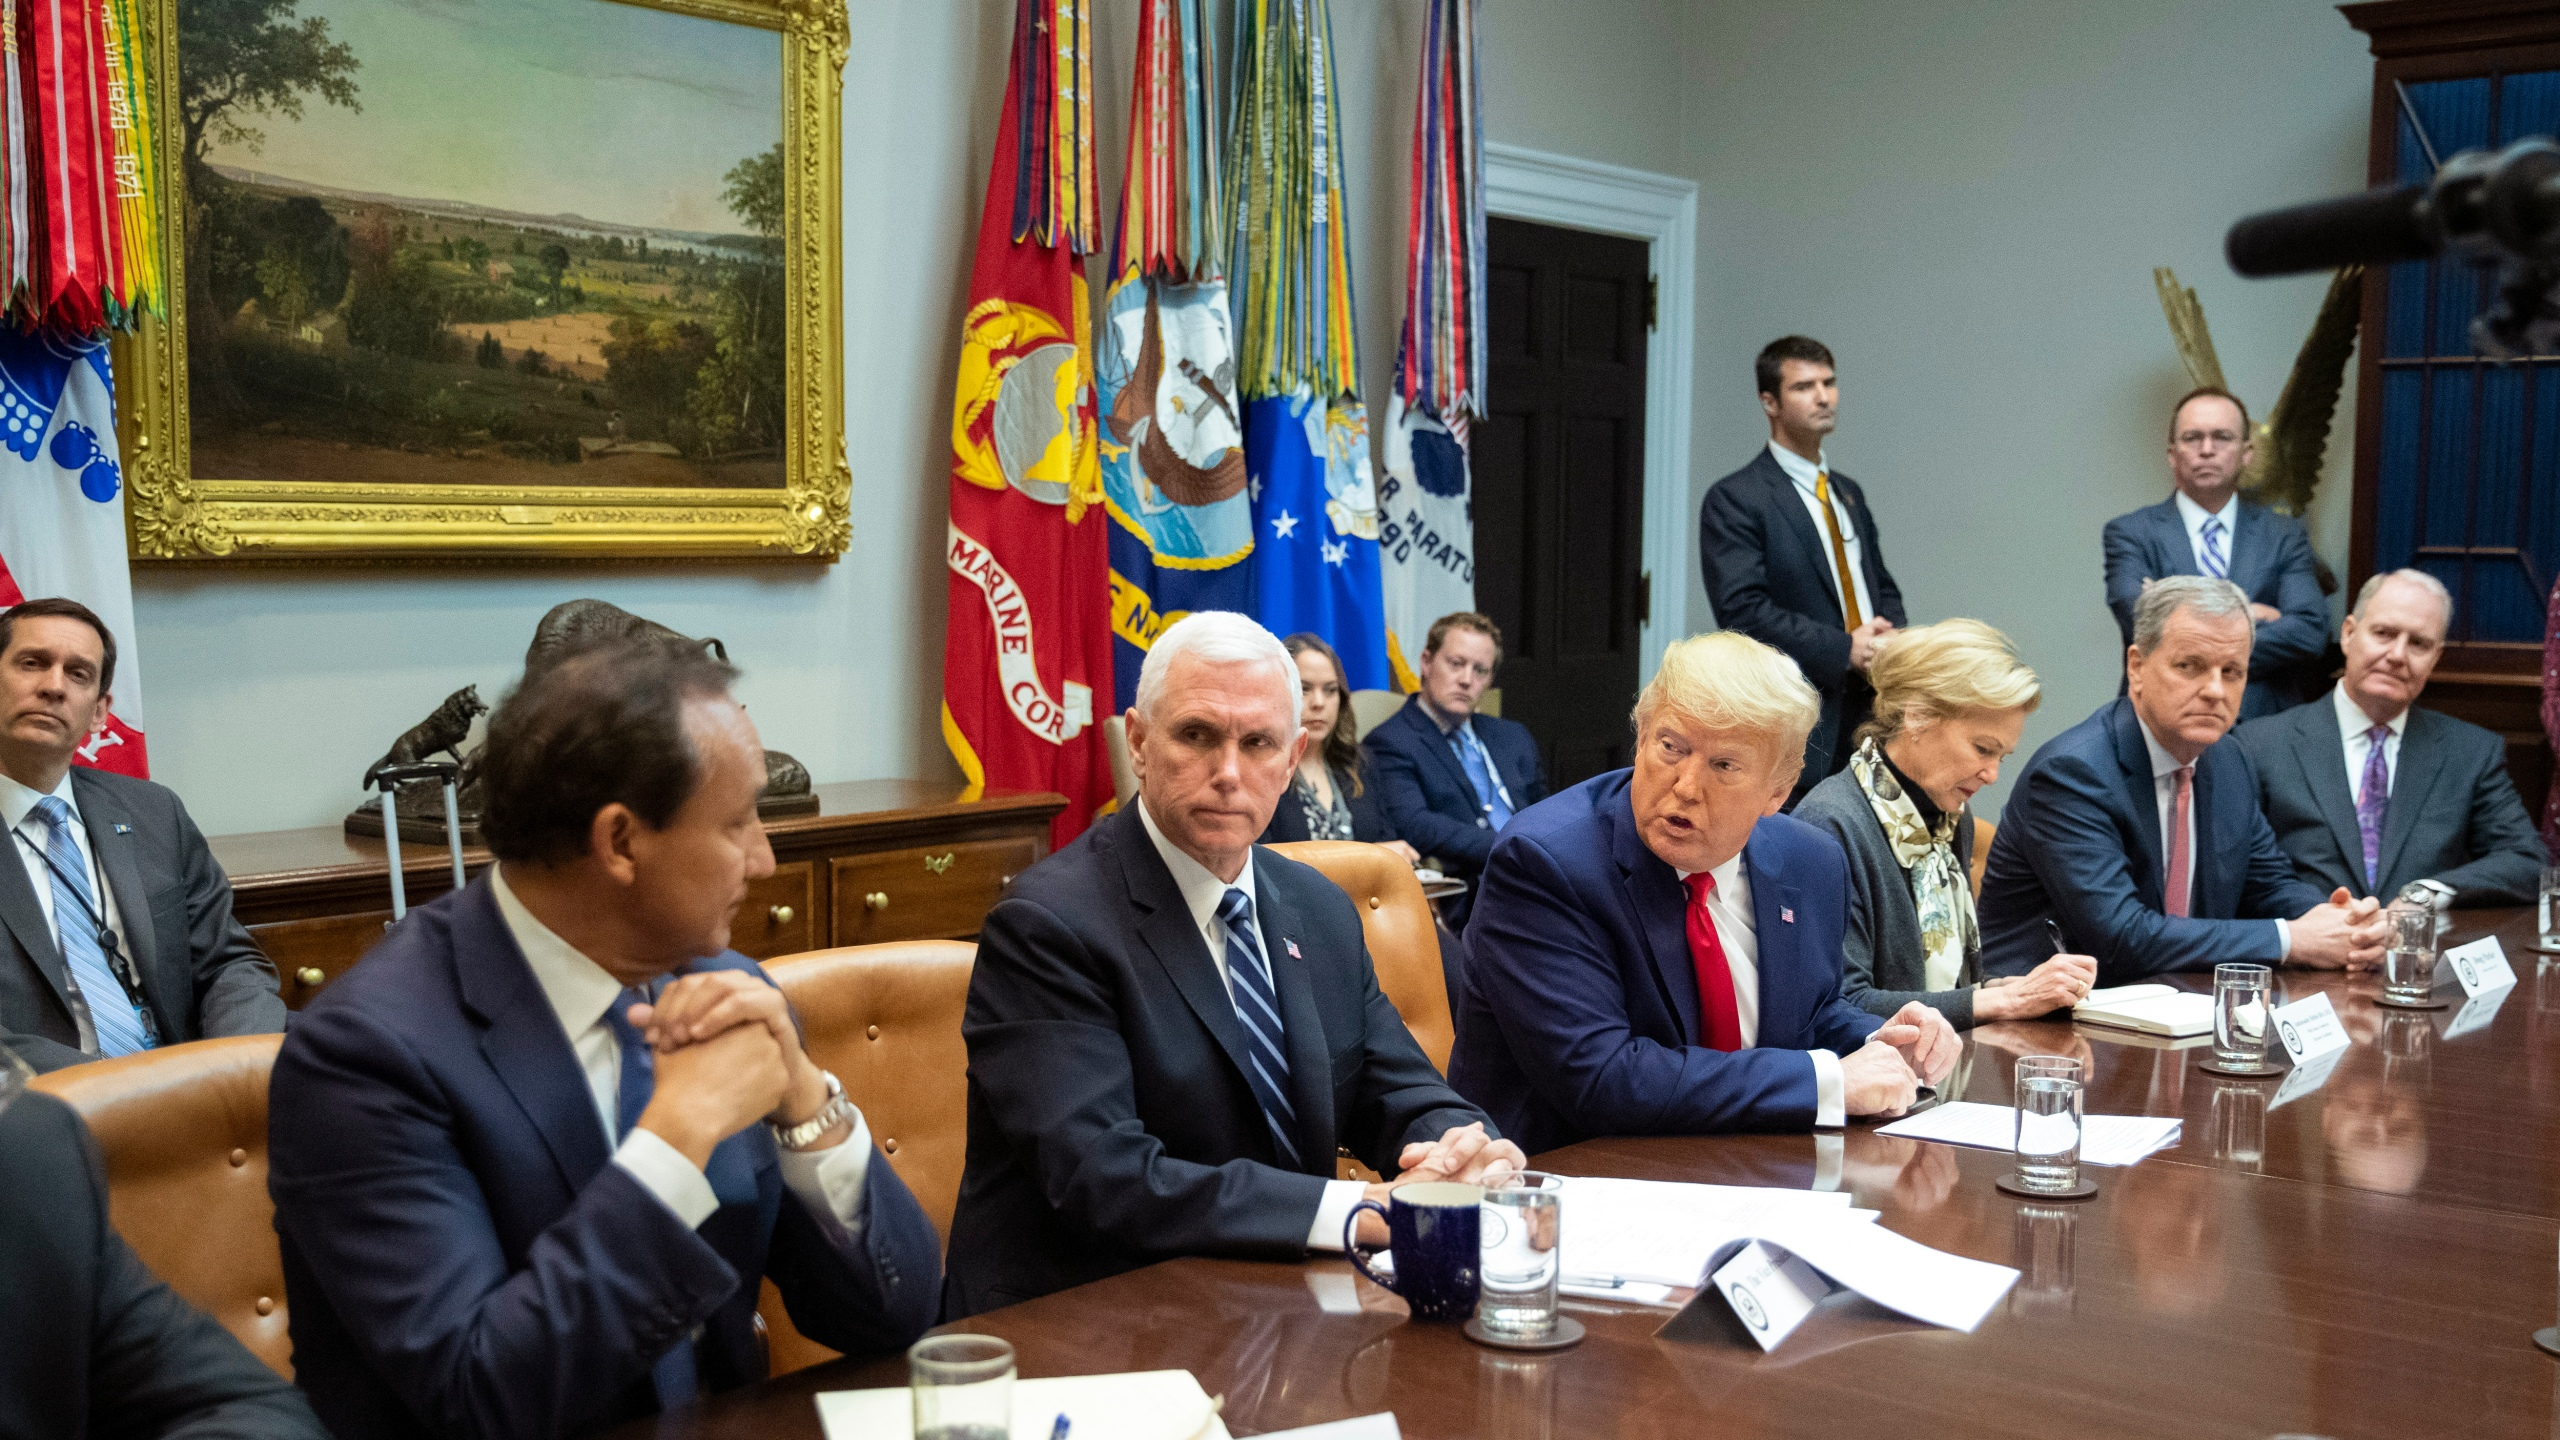 Donald Trump, Mike Pence, Deborah Birx, Oscar Munos, Doug Parker, Gary Kelly